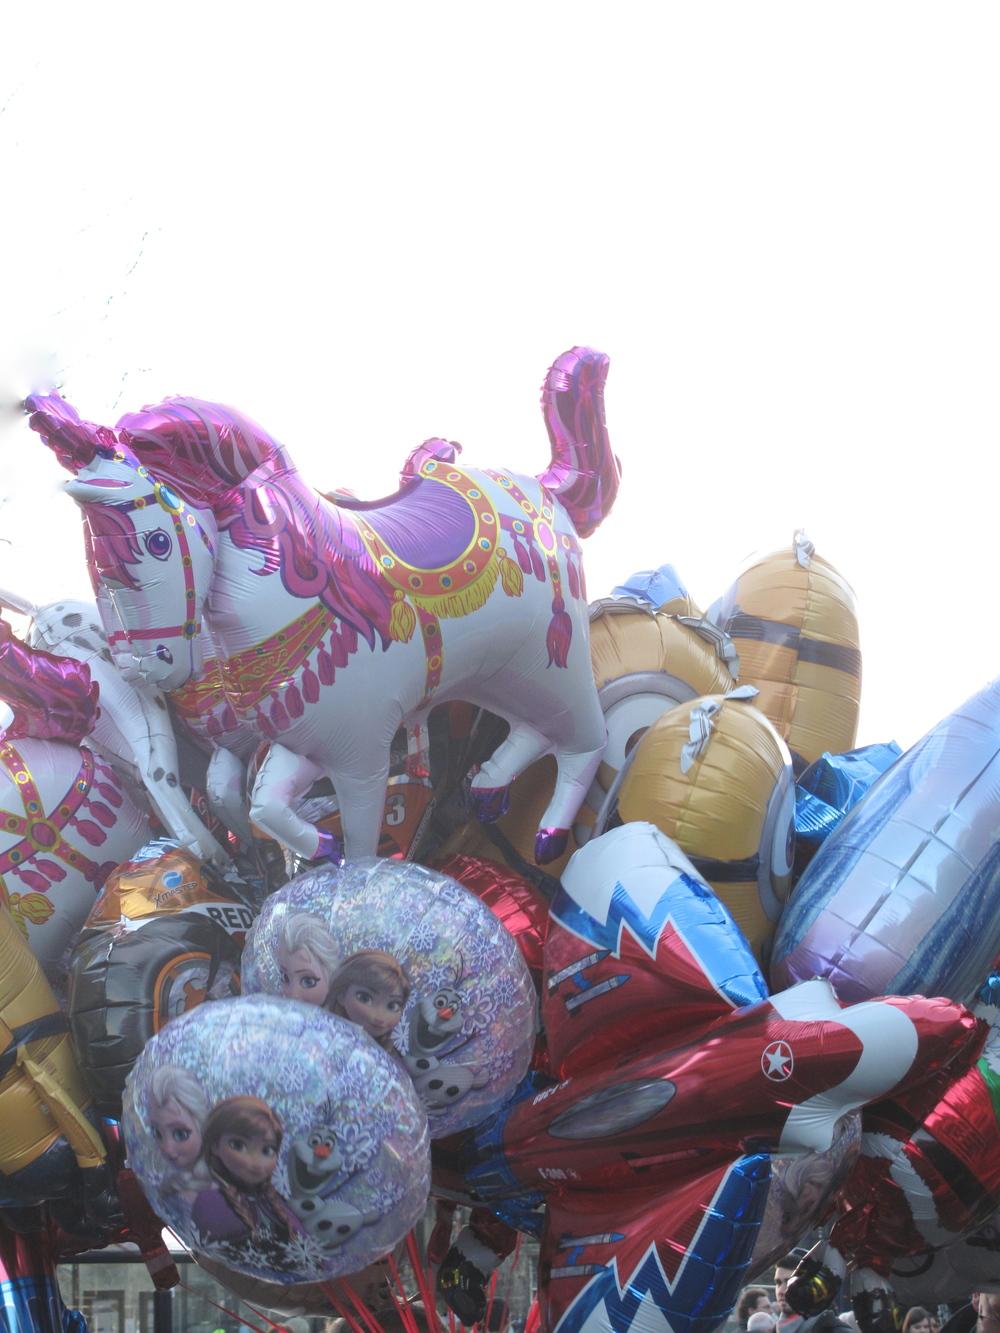 Helium balloons of unicorns.